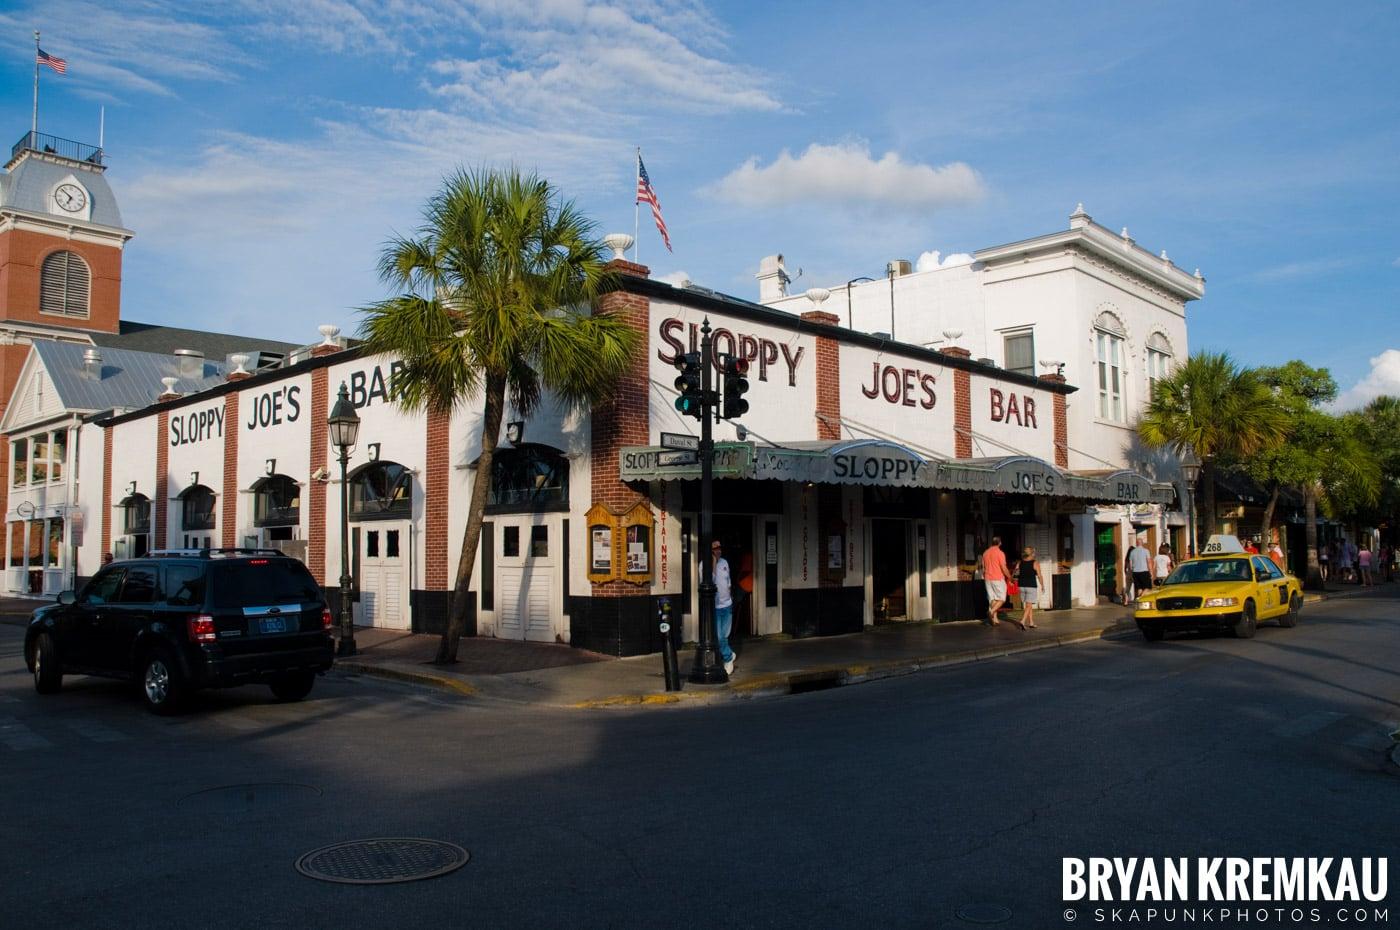 Florida Keys Vacation - 7.09.10 - 7.15.10 (44)